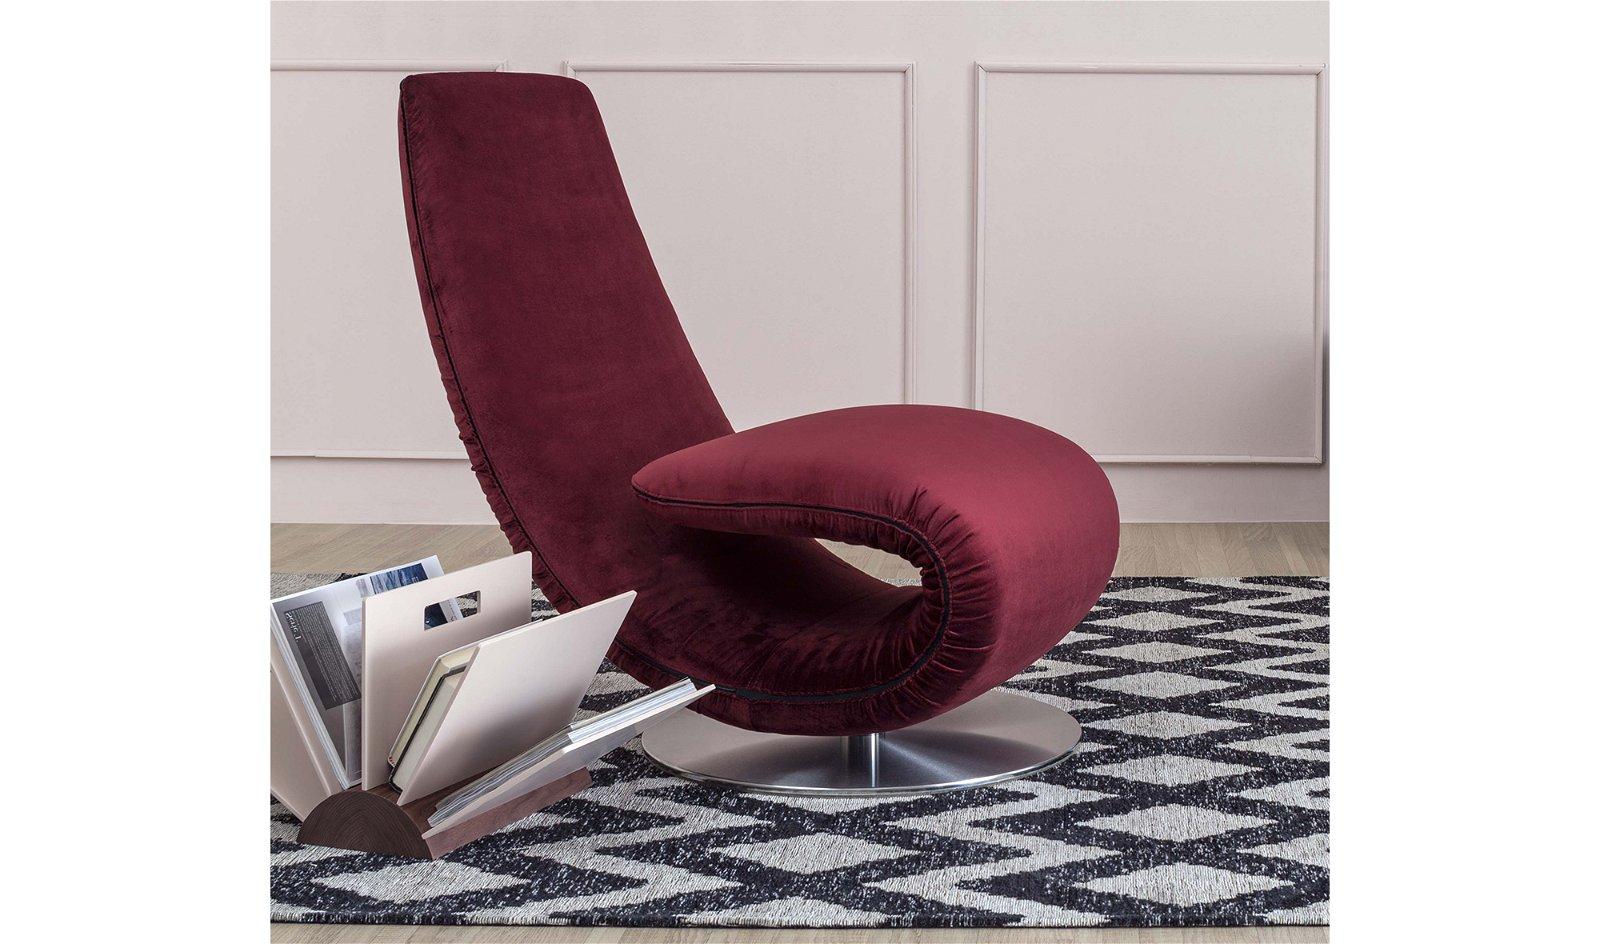 Chaise longue moderno Ricciolo